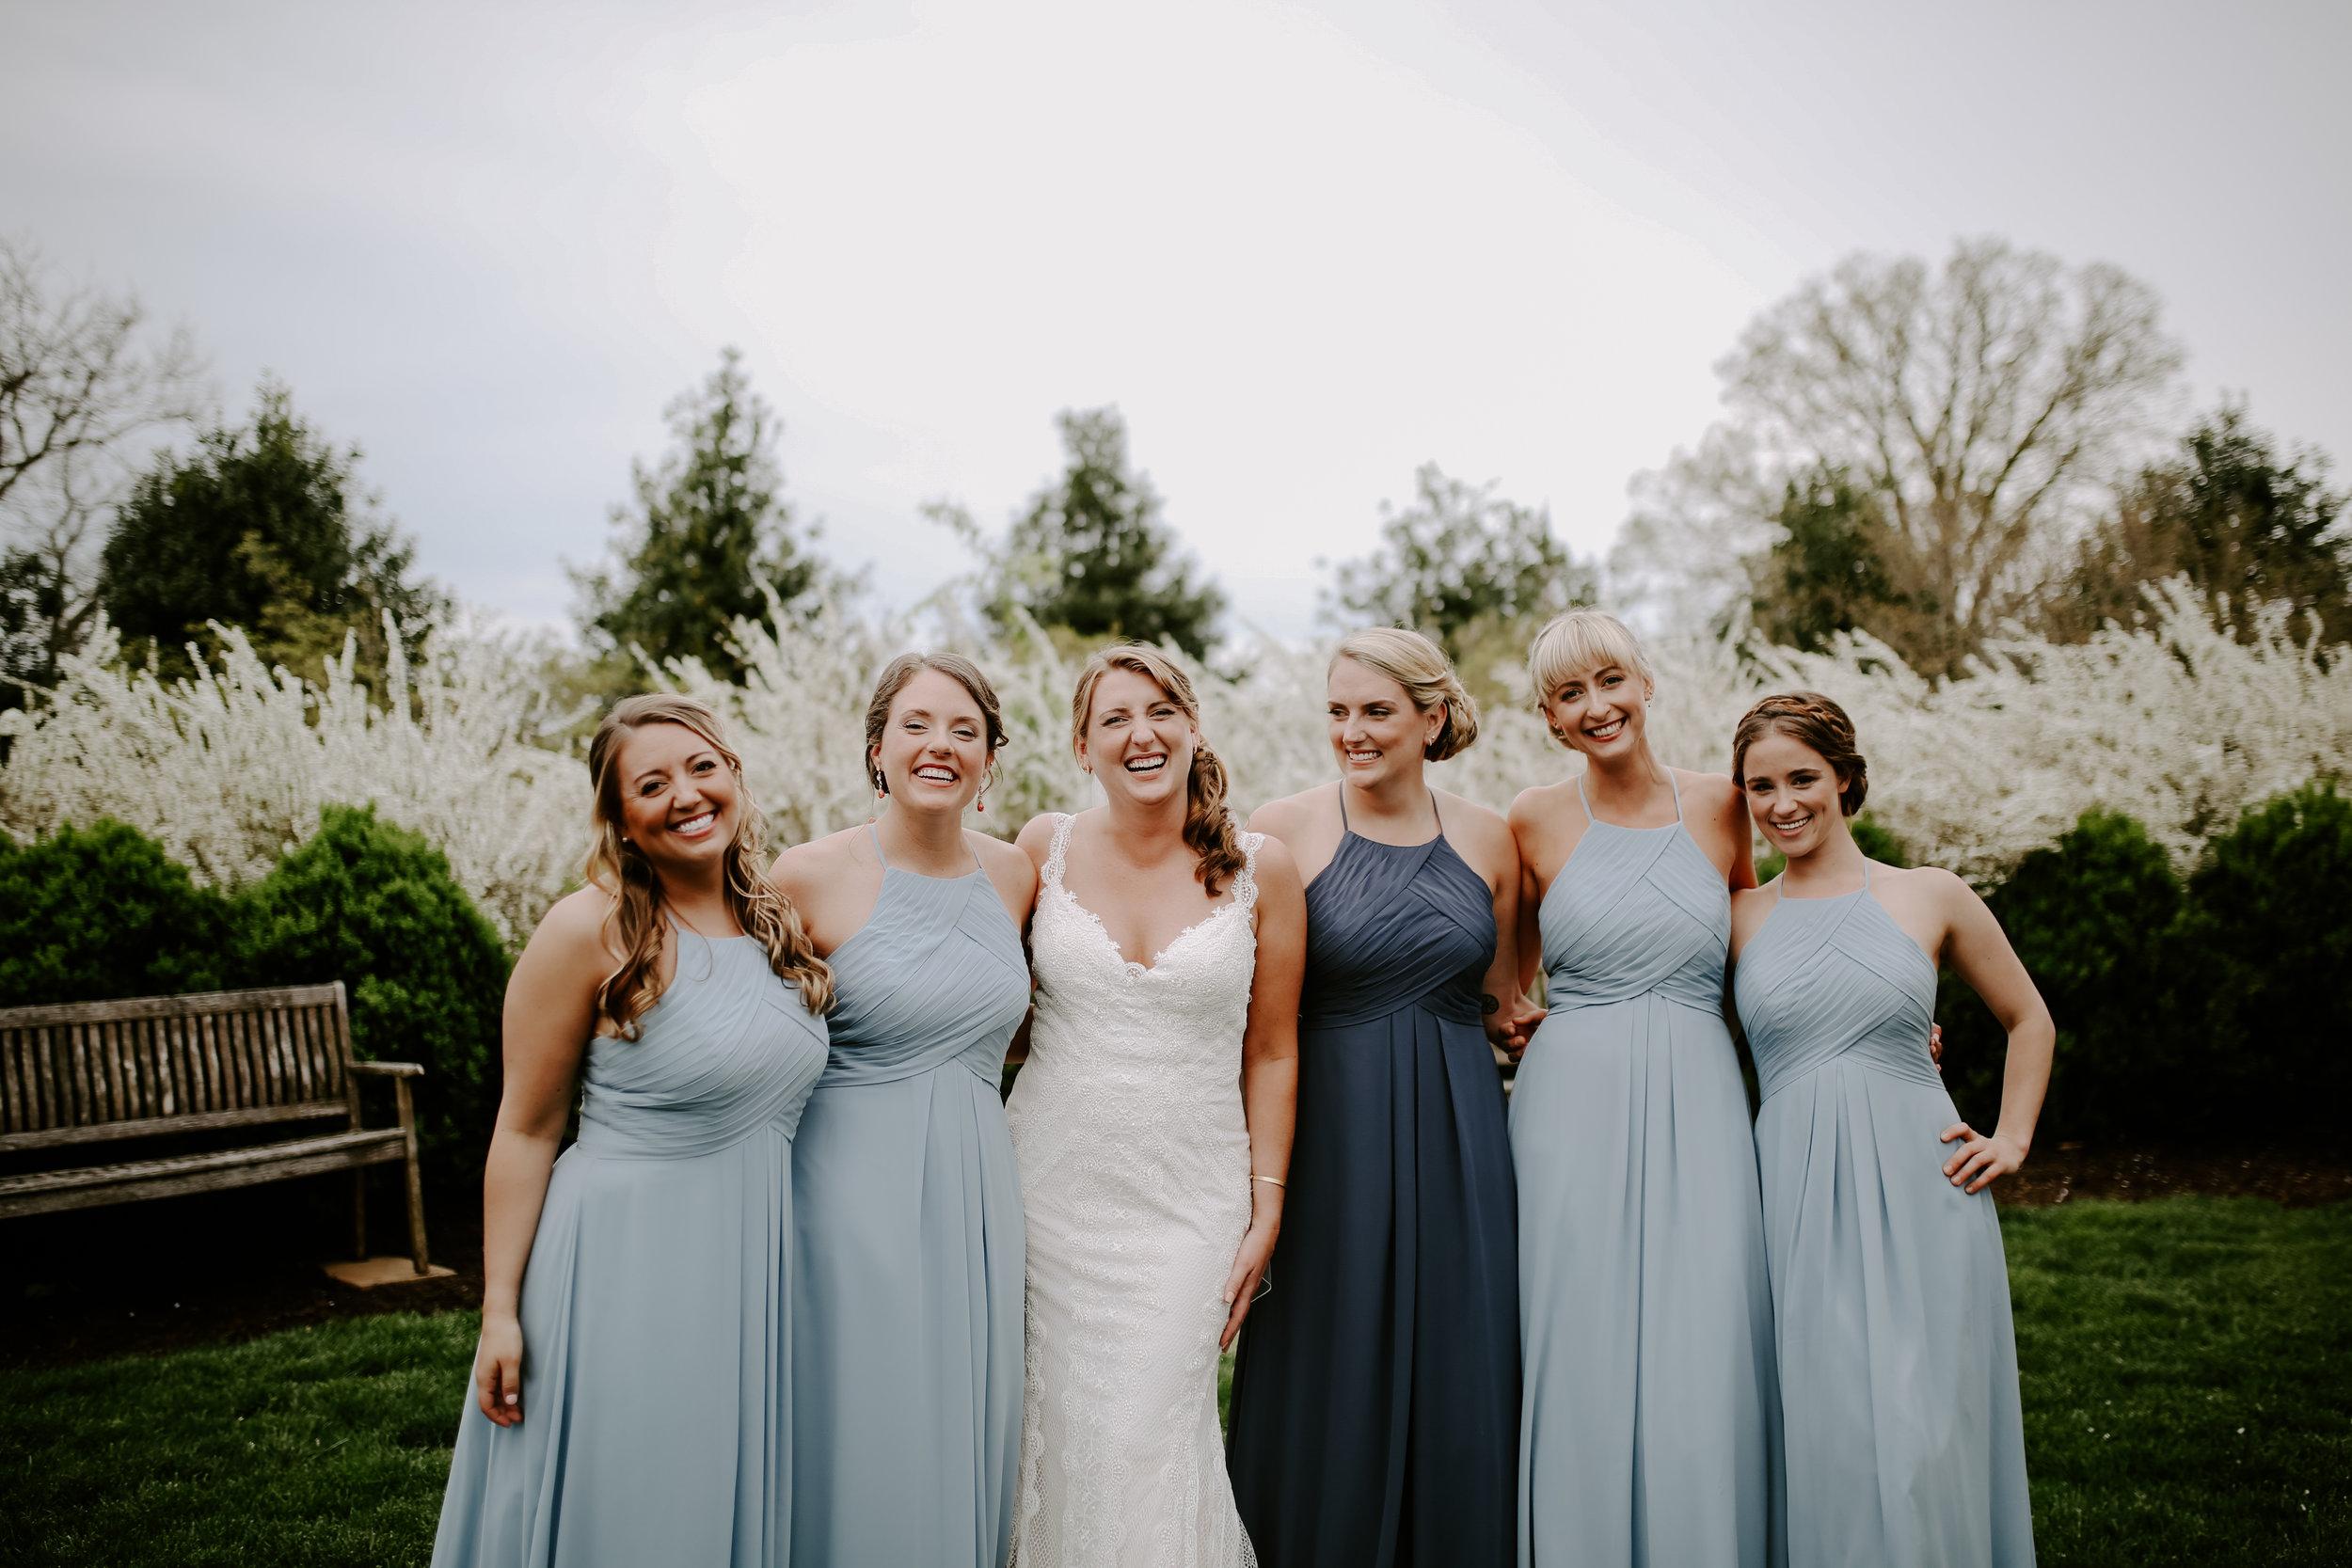 TheGreens_Married_2019-140.jpg